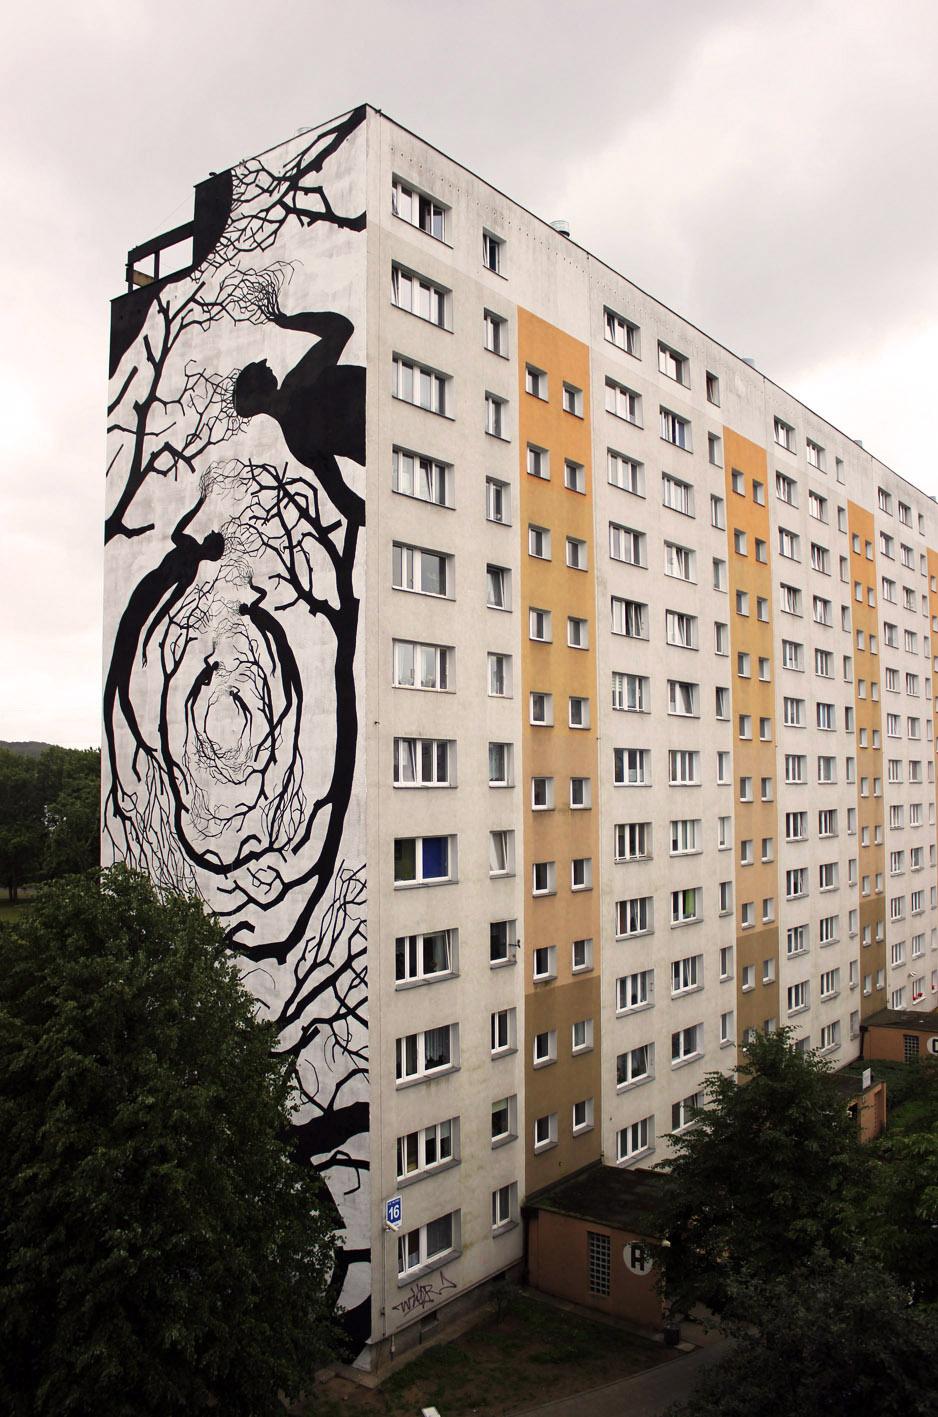 wk_david-de-la-mano_monumental-art-festival-1